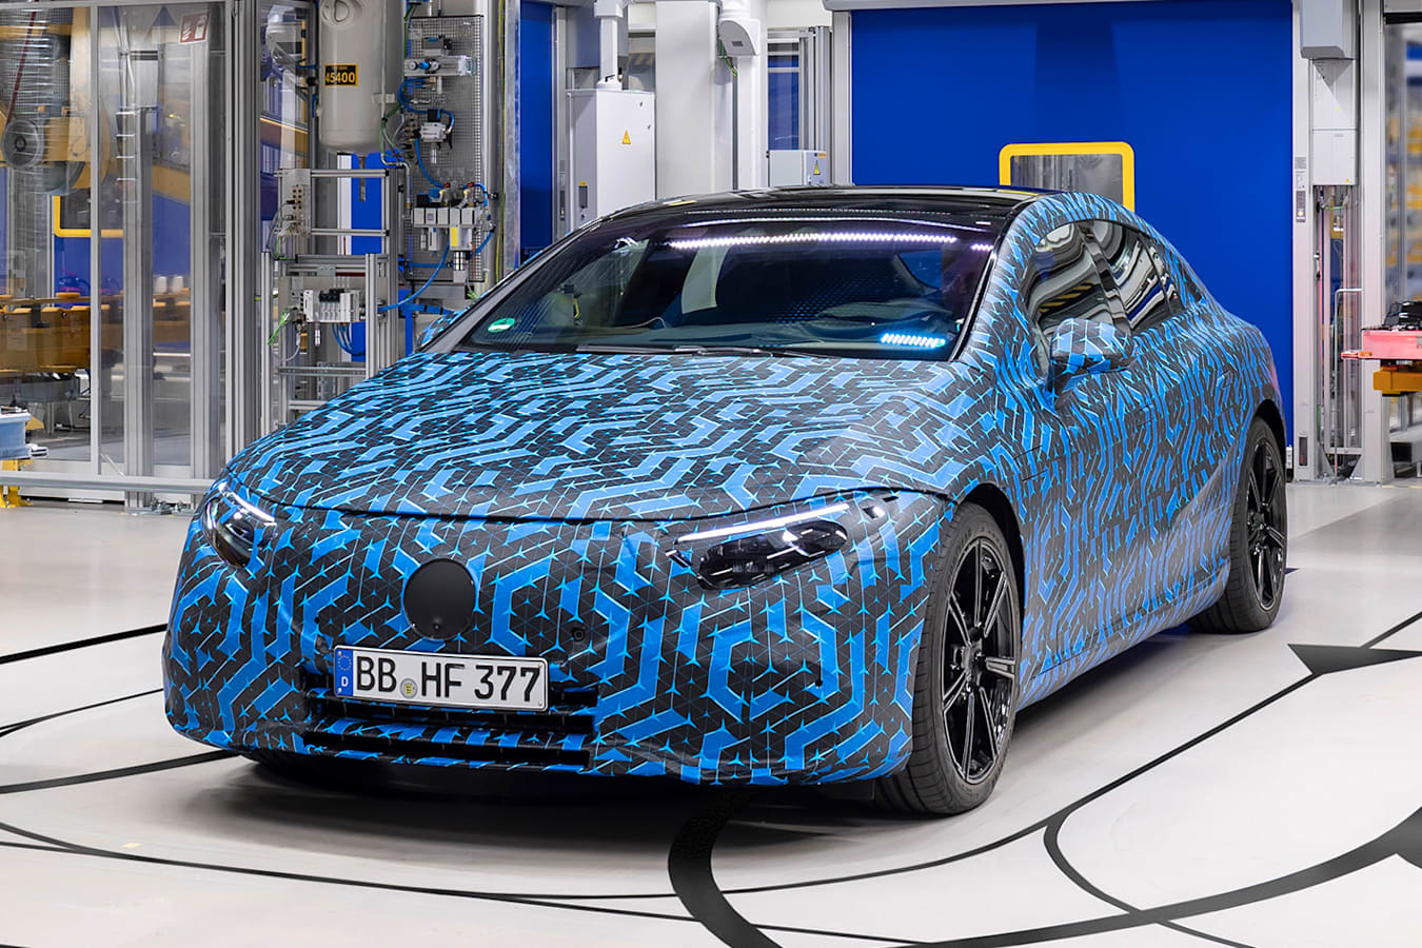 Mercedes EQ production